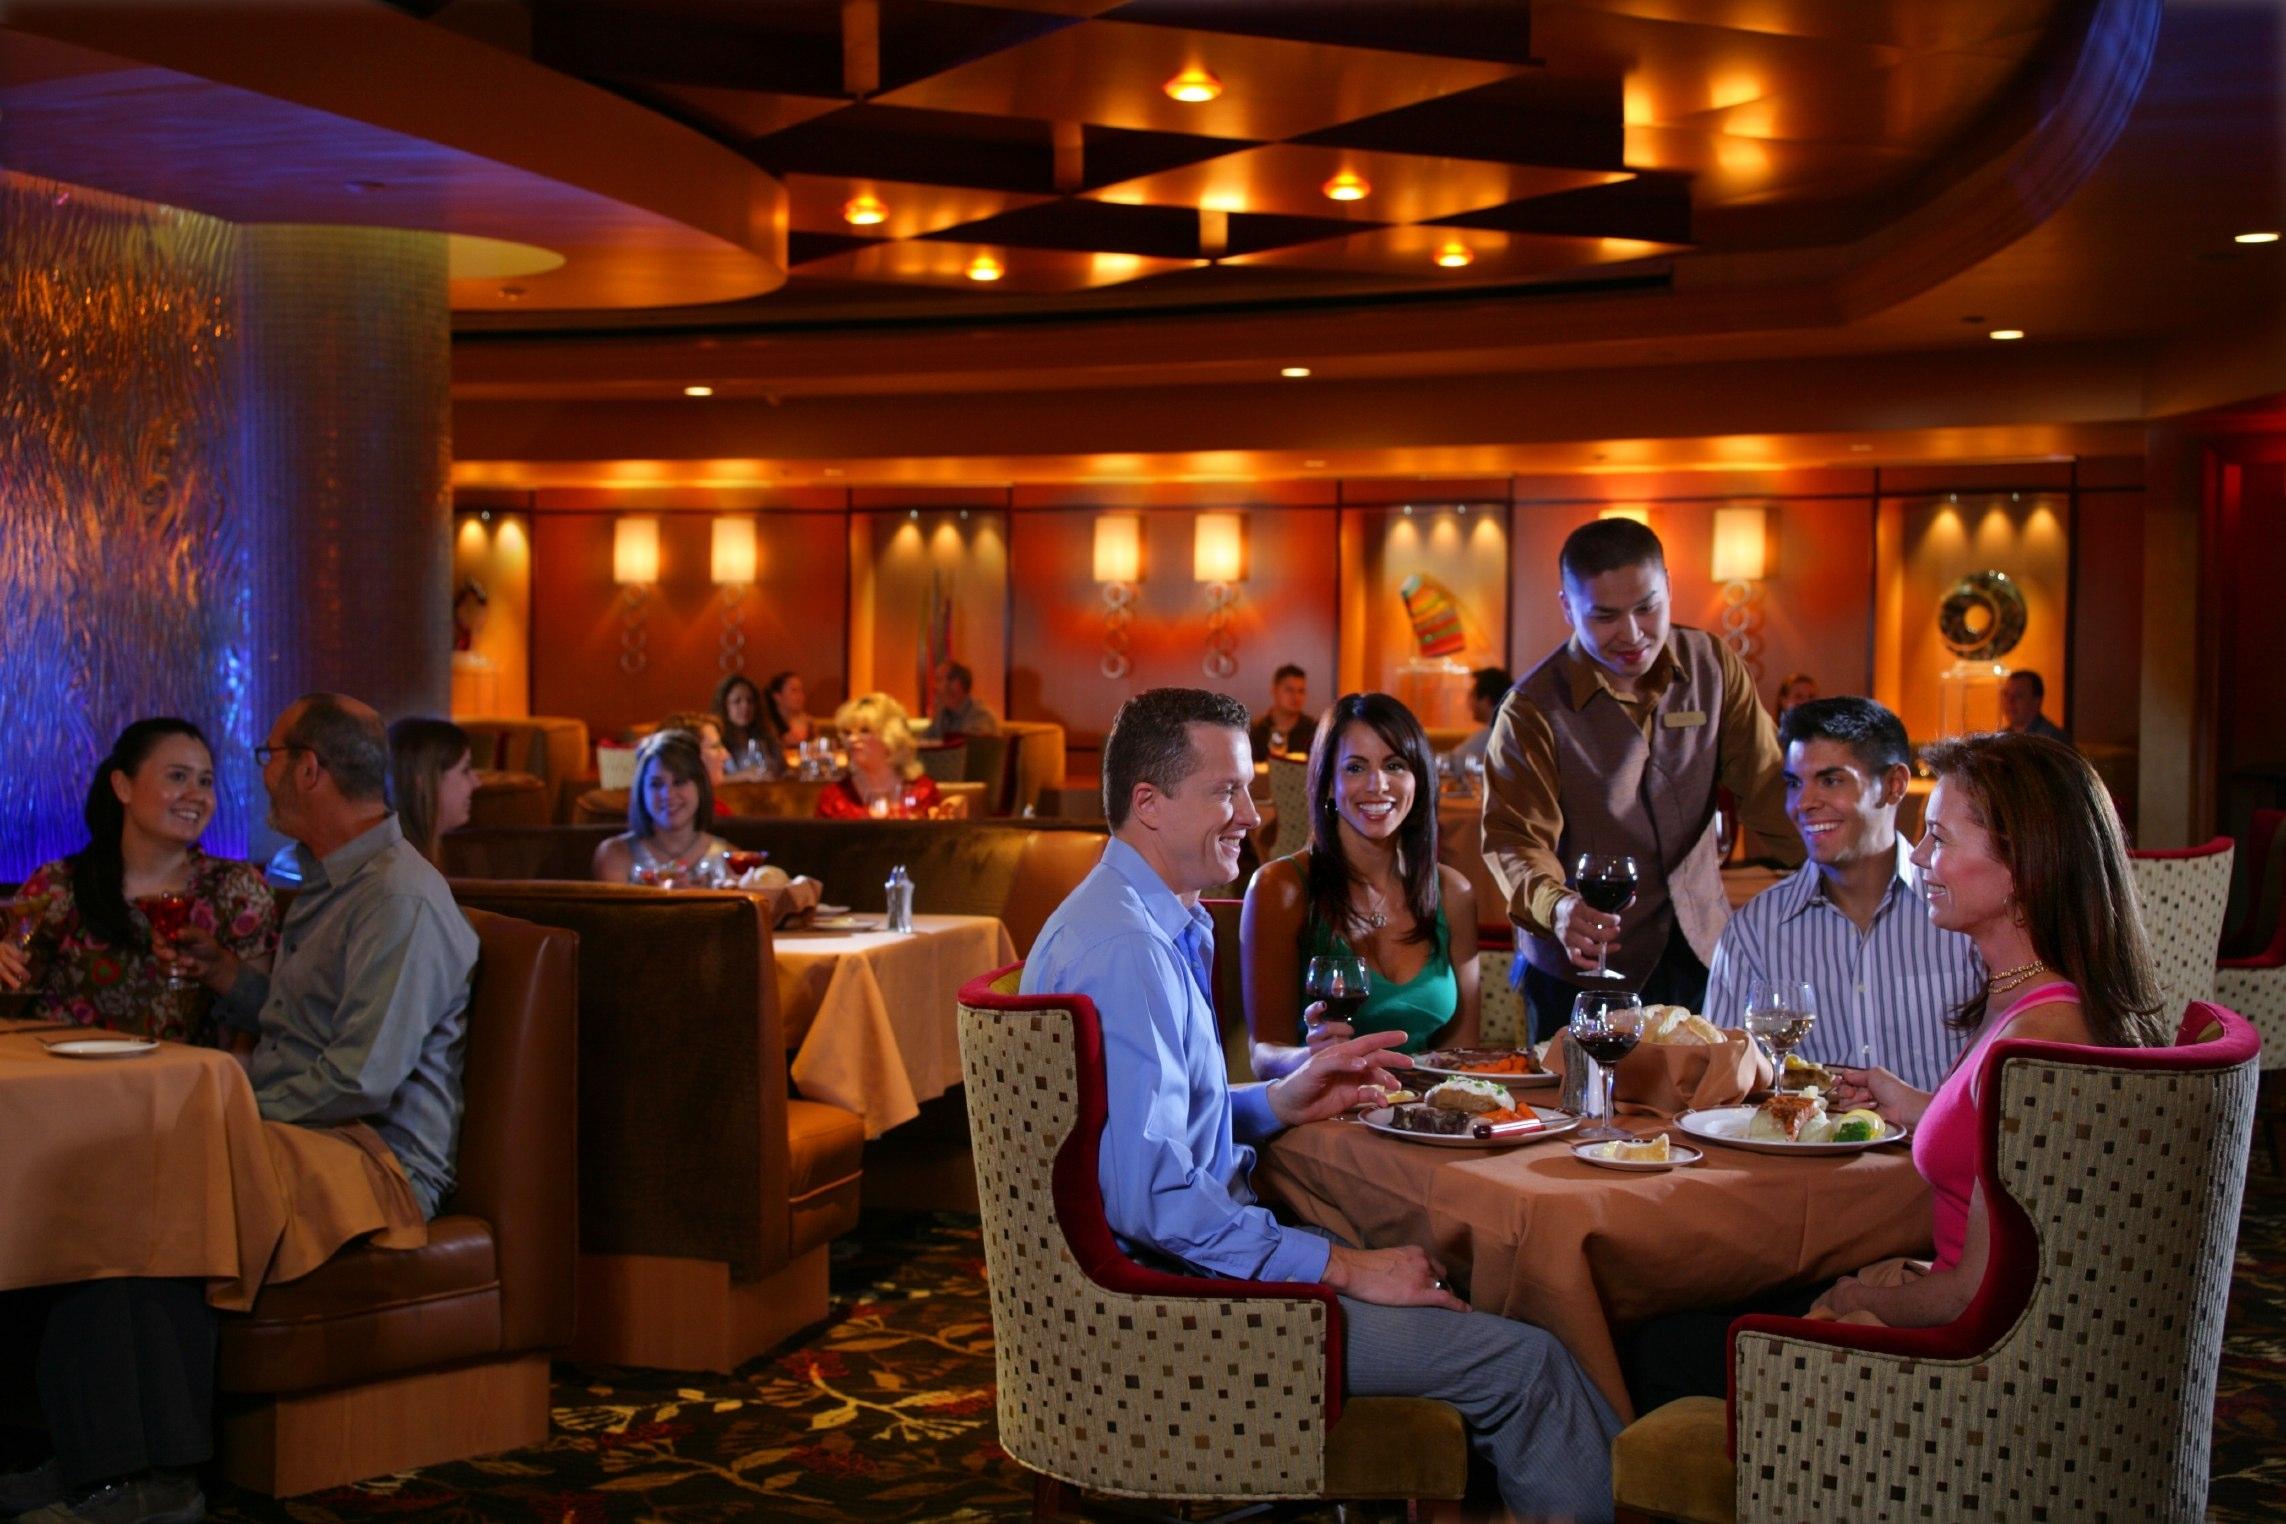 Grand Ballroom At South Point Hotel Casino Spa Las Vegas Venue Eventopedia